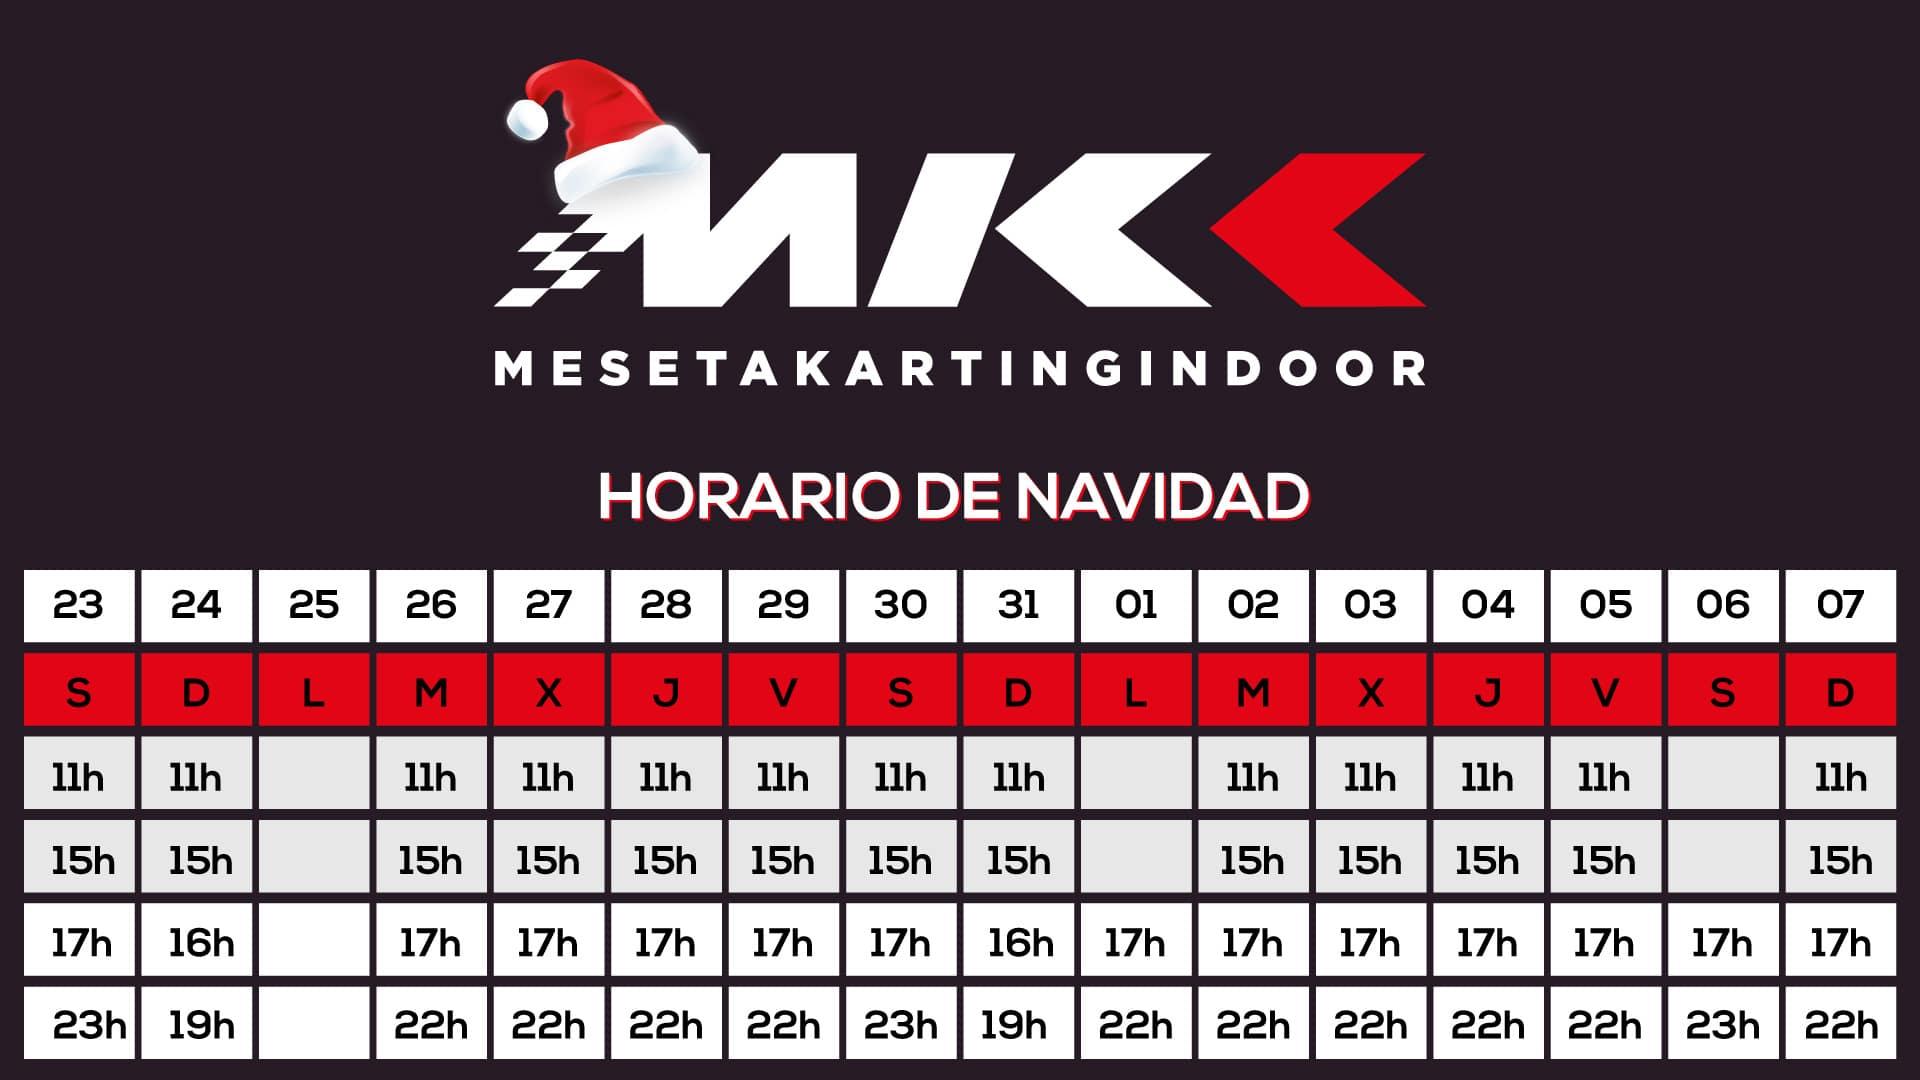 HORARIO NAVIDAD 17 Meseta Karting